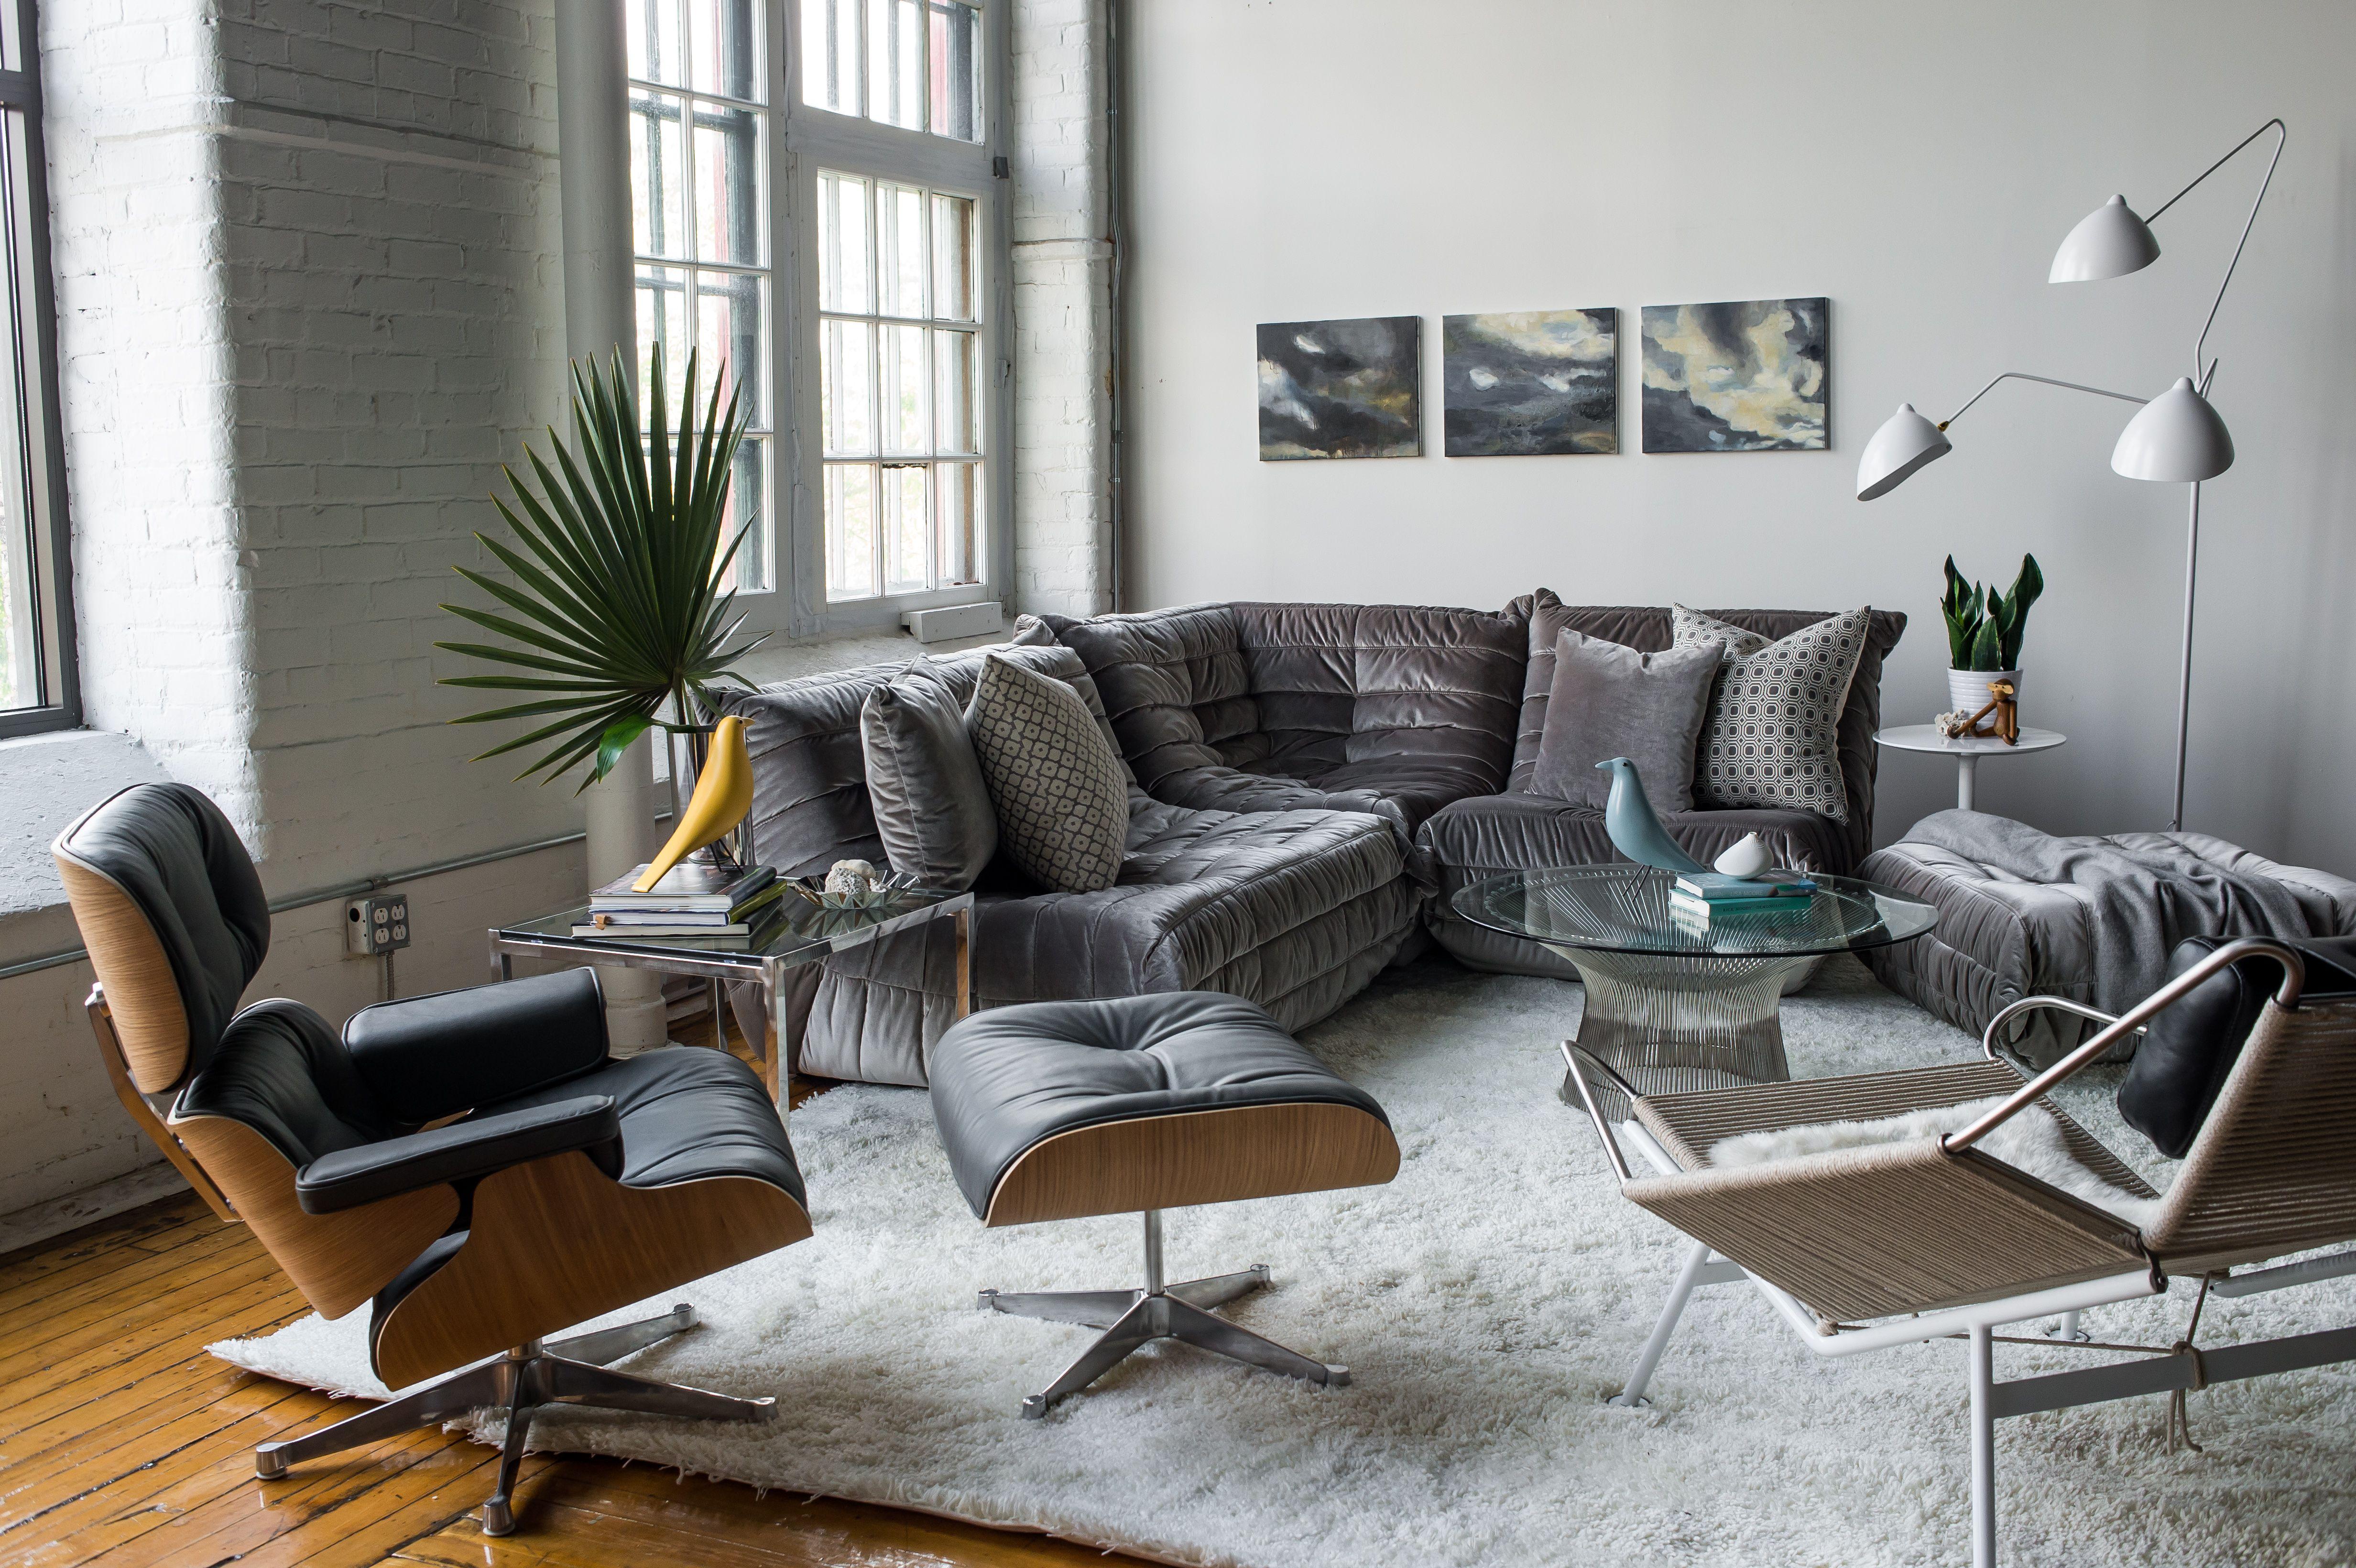 Eames Lounge Chair Living Room lounge design furniture - kumpalo.parkersydnorhistoric